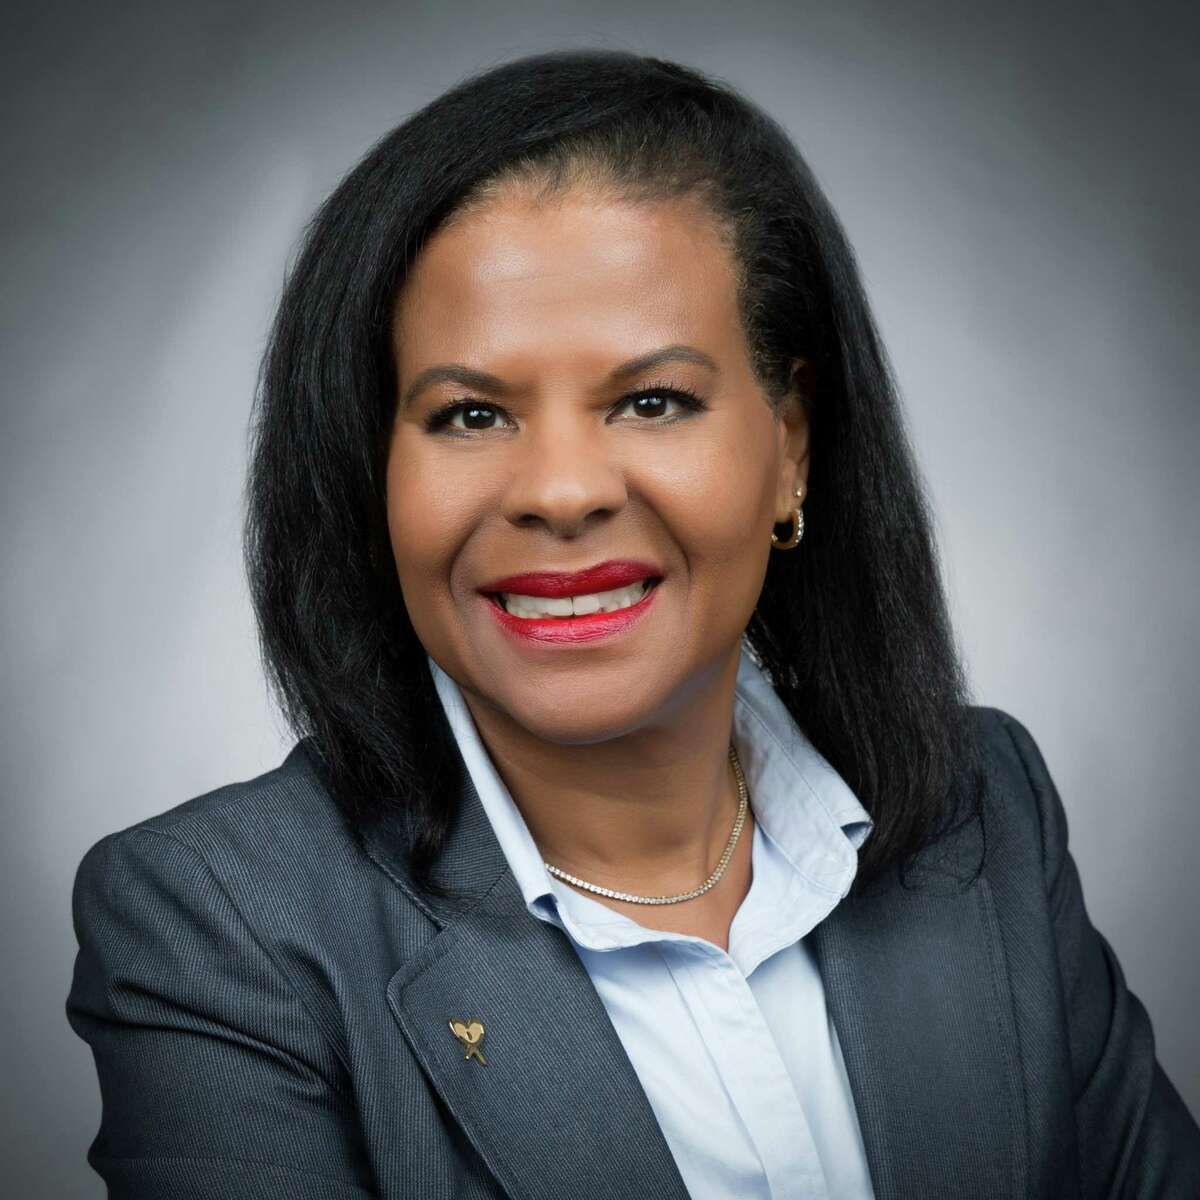 Vicki Spriggs: Texas legislators made major advancements to improve foster care.